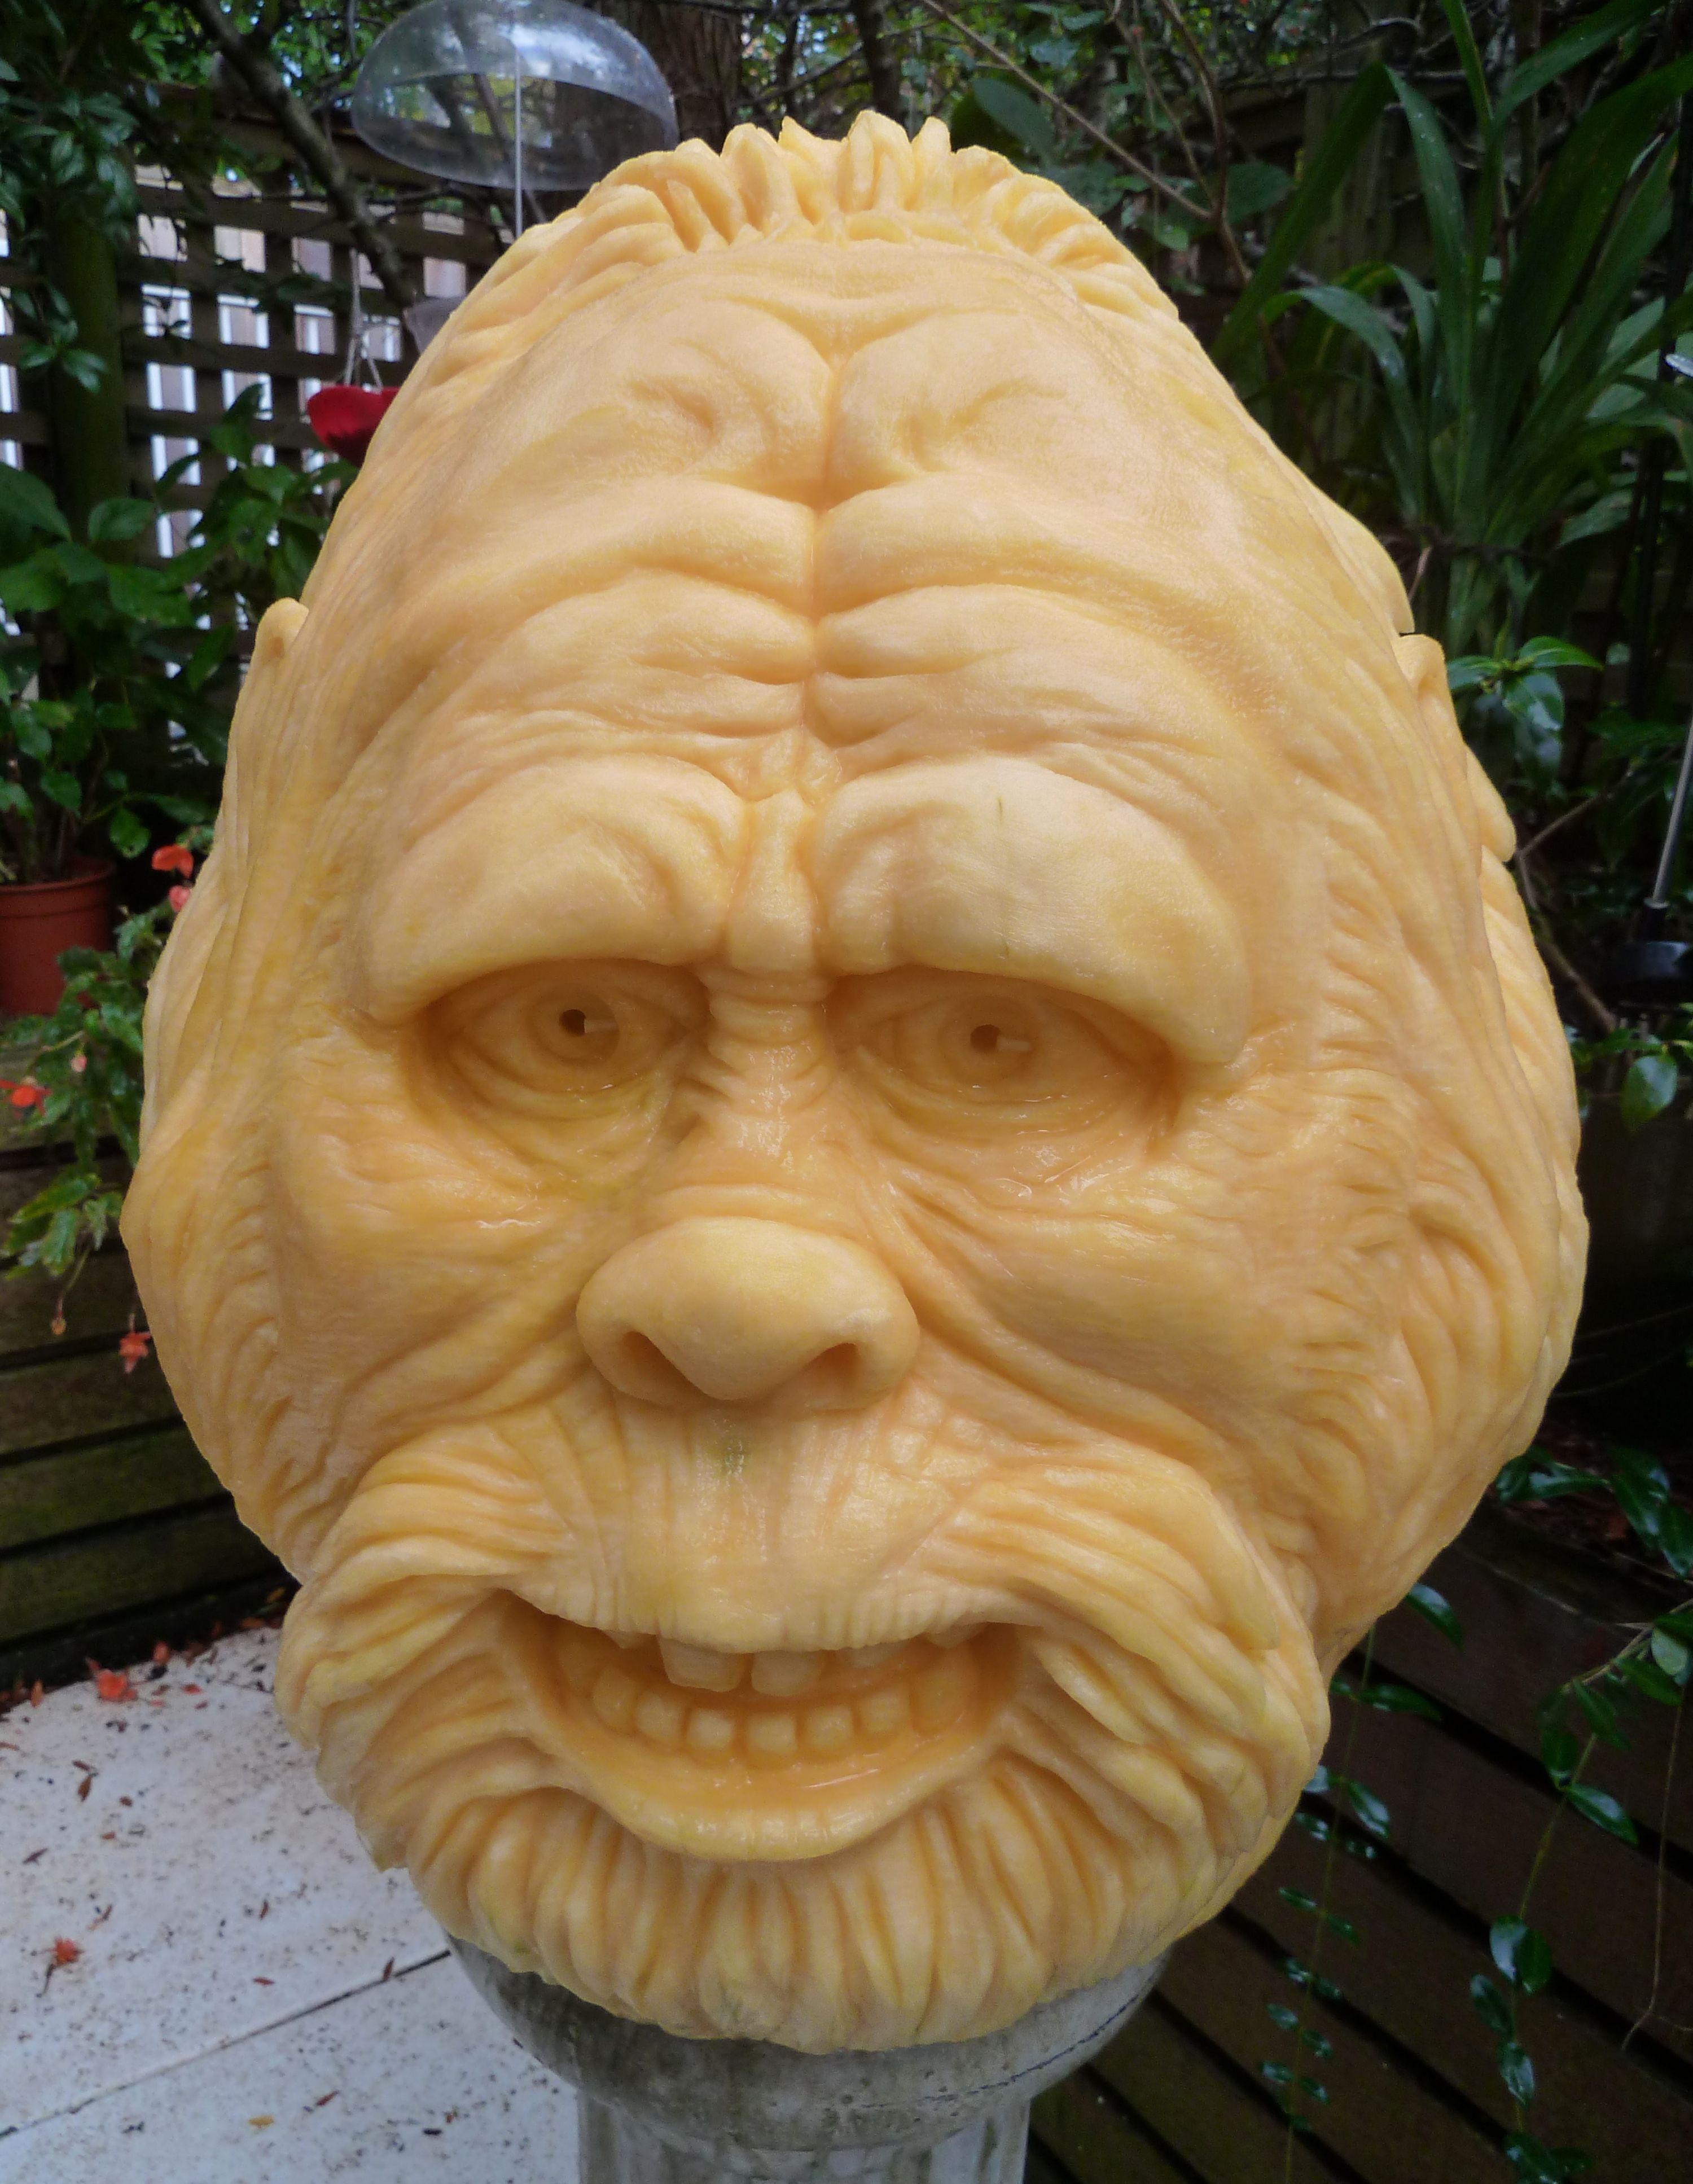 Sasquatch Pumpkin Carving By Clive Cooper Pumpkin Carving By - Mind blowing pumpkin carvings by ray villafane 2